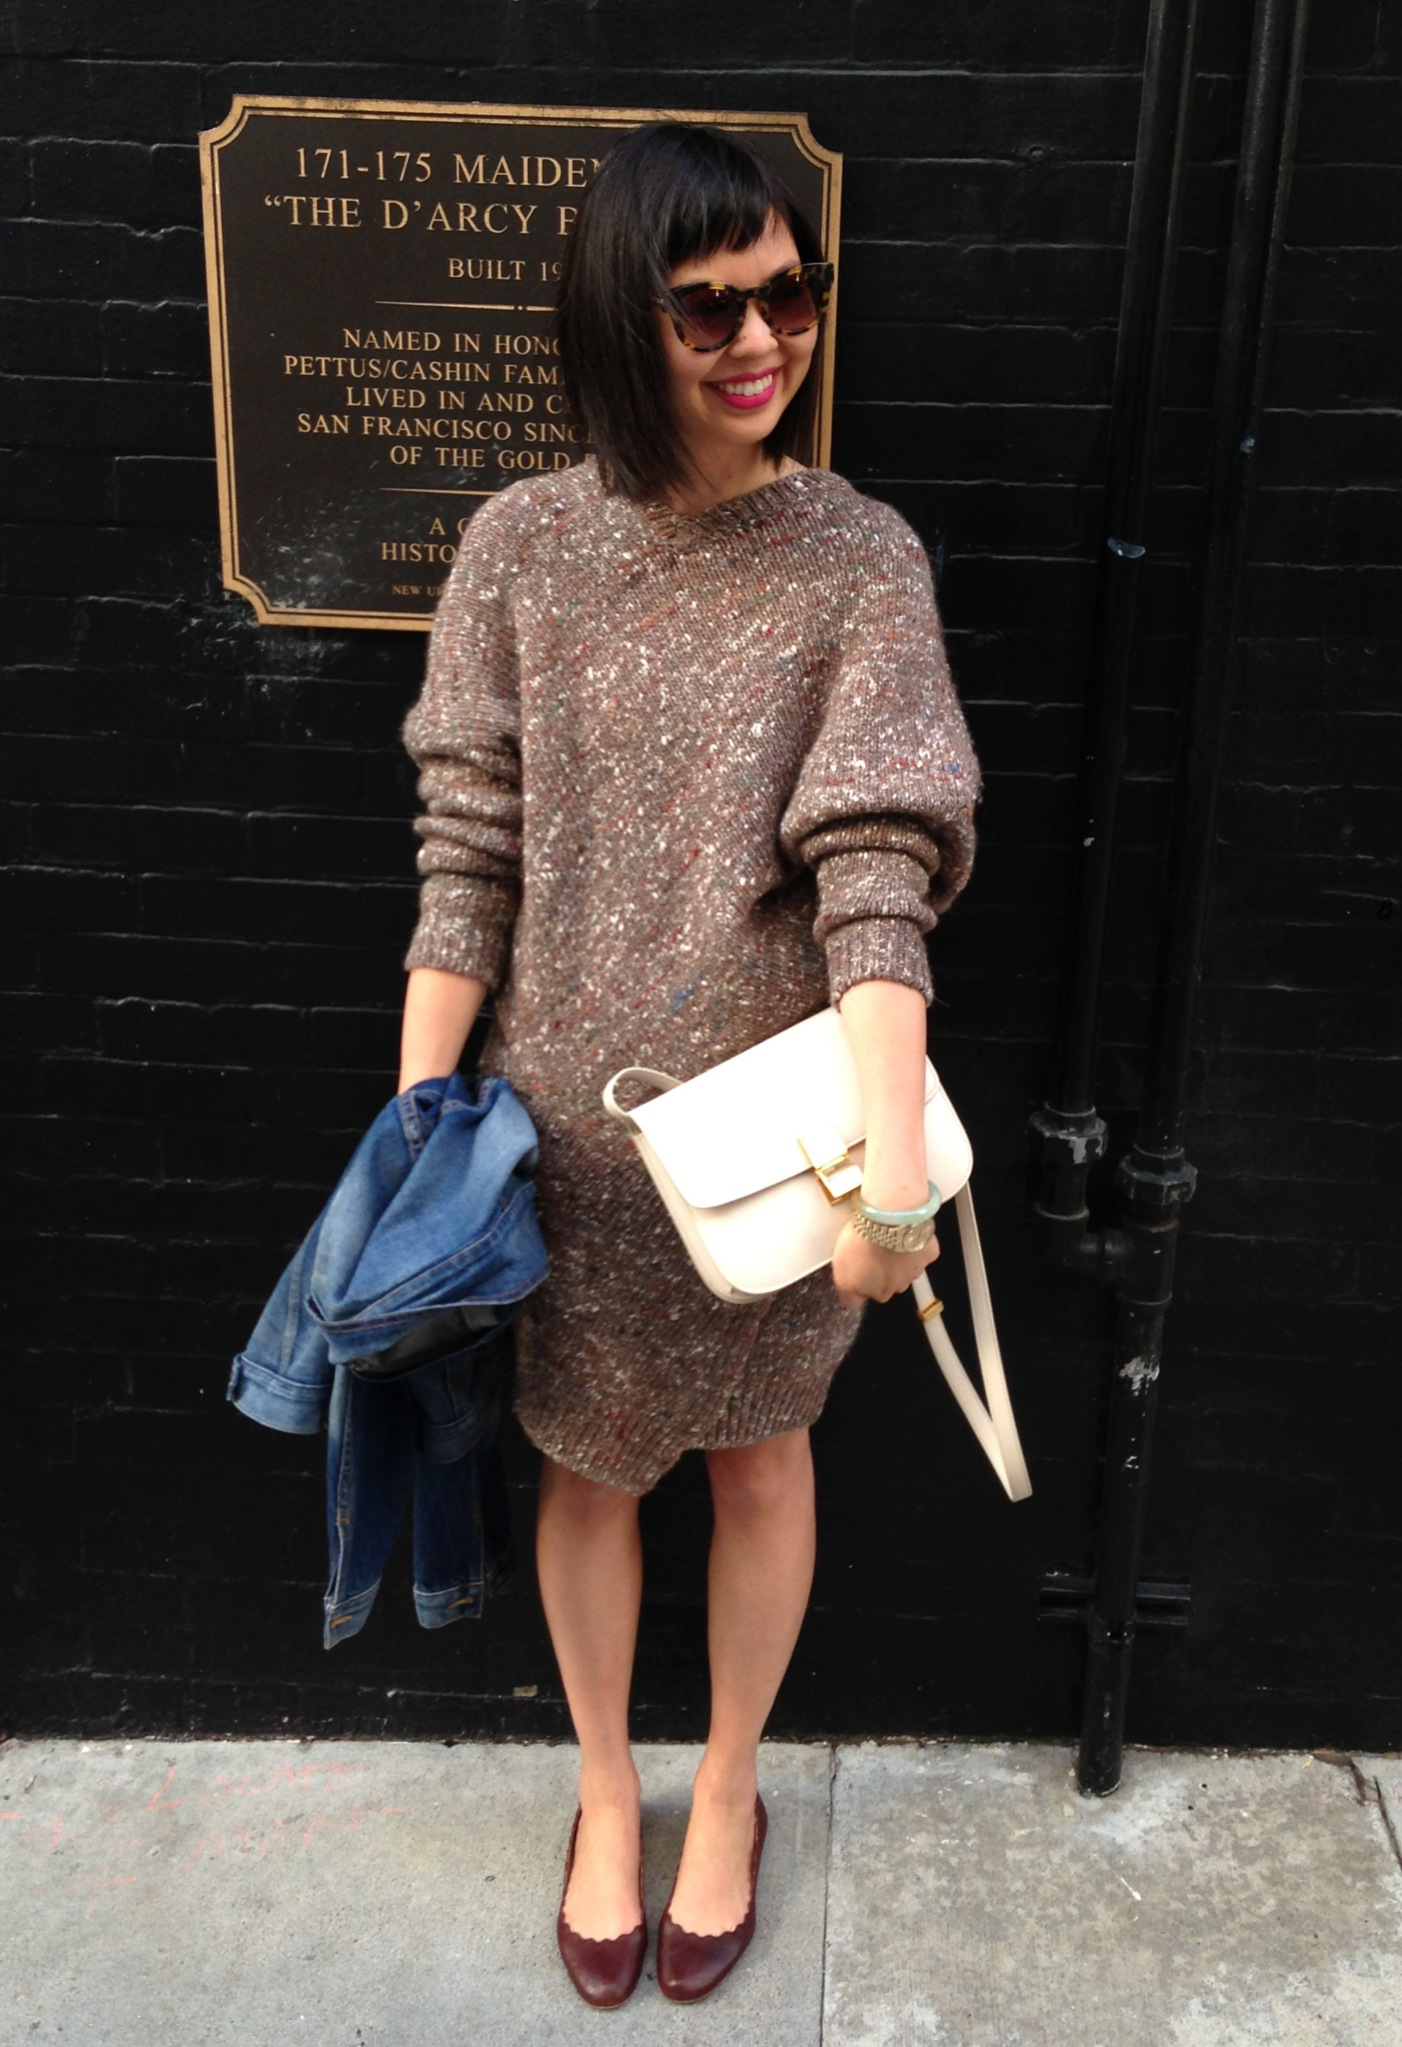 ... celine ivory box bag stella mccartney chunky knit sweater dress with  chloe scallop ballet flats e98d762b1b2e5